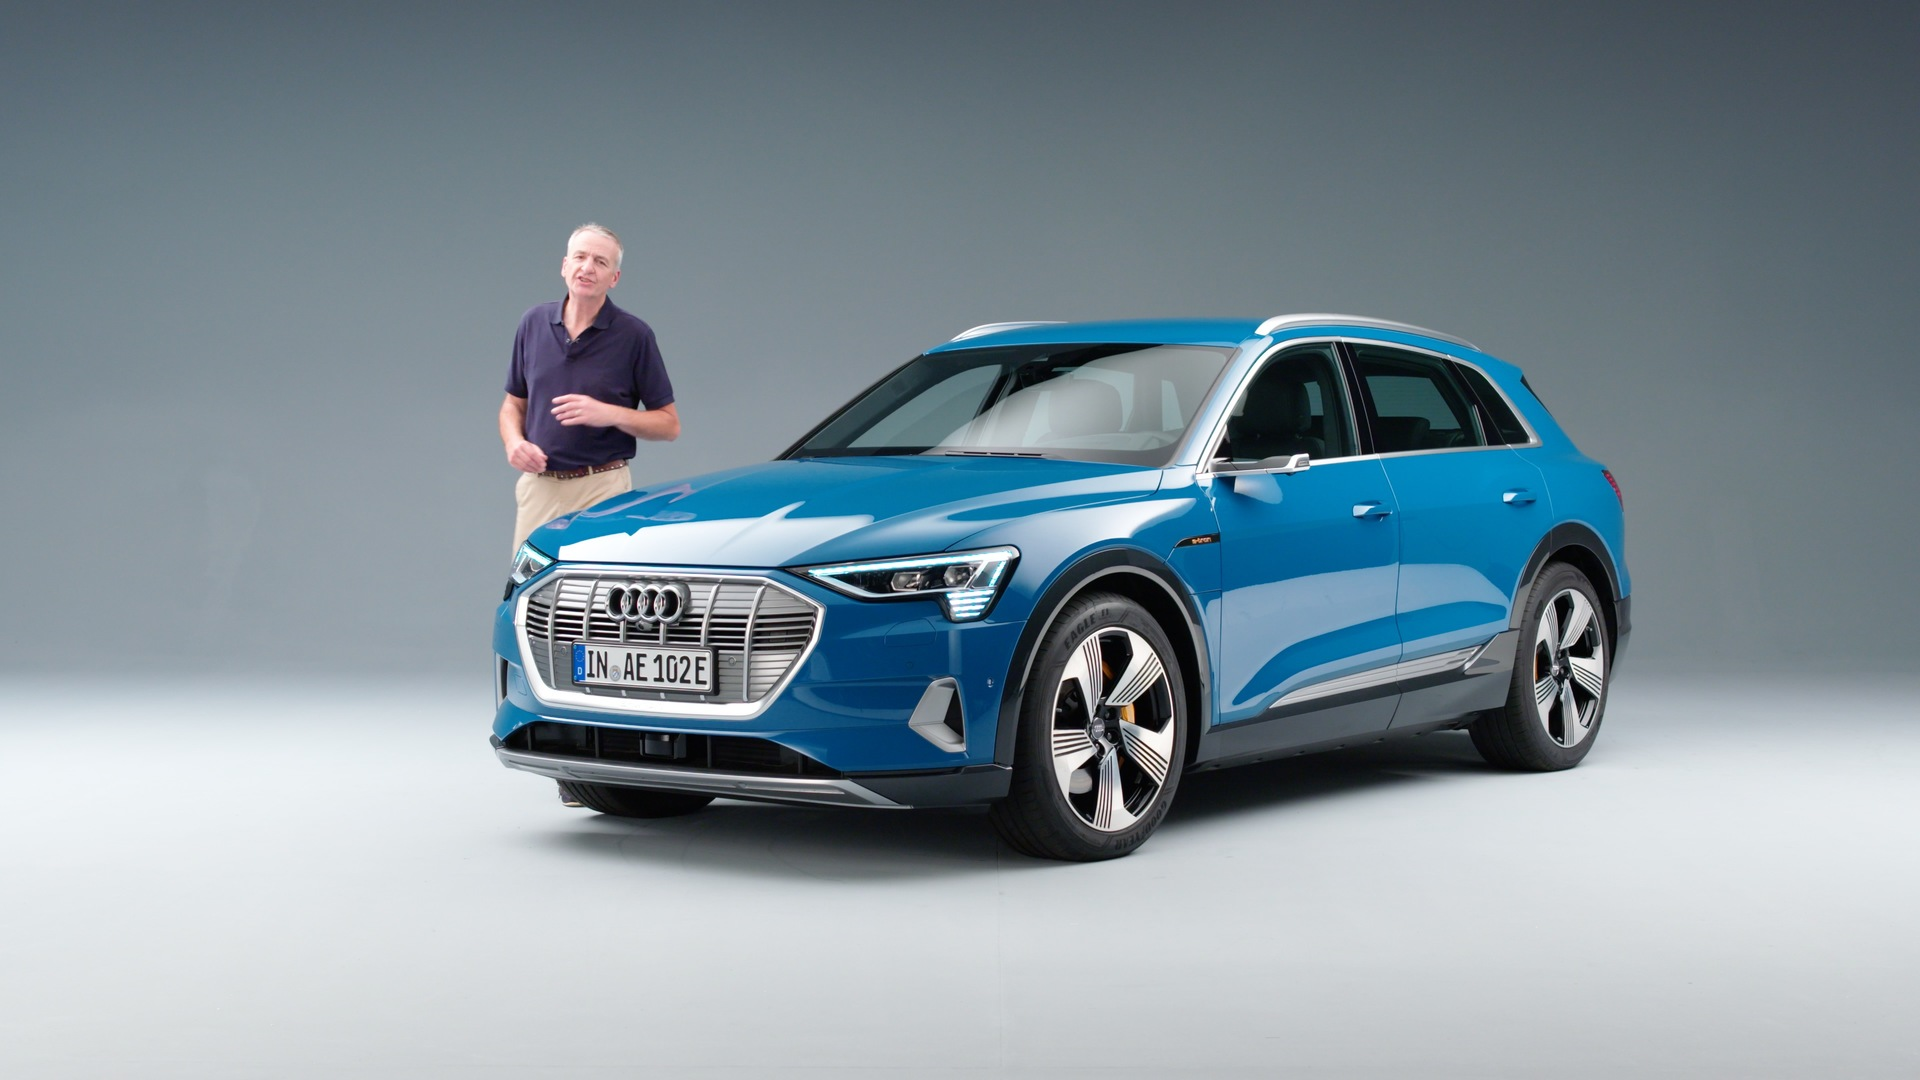 Review: the Audi e-tron